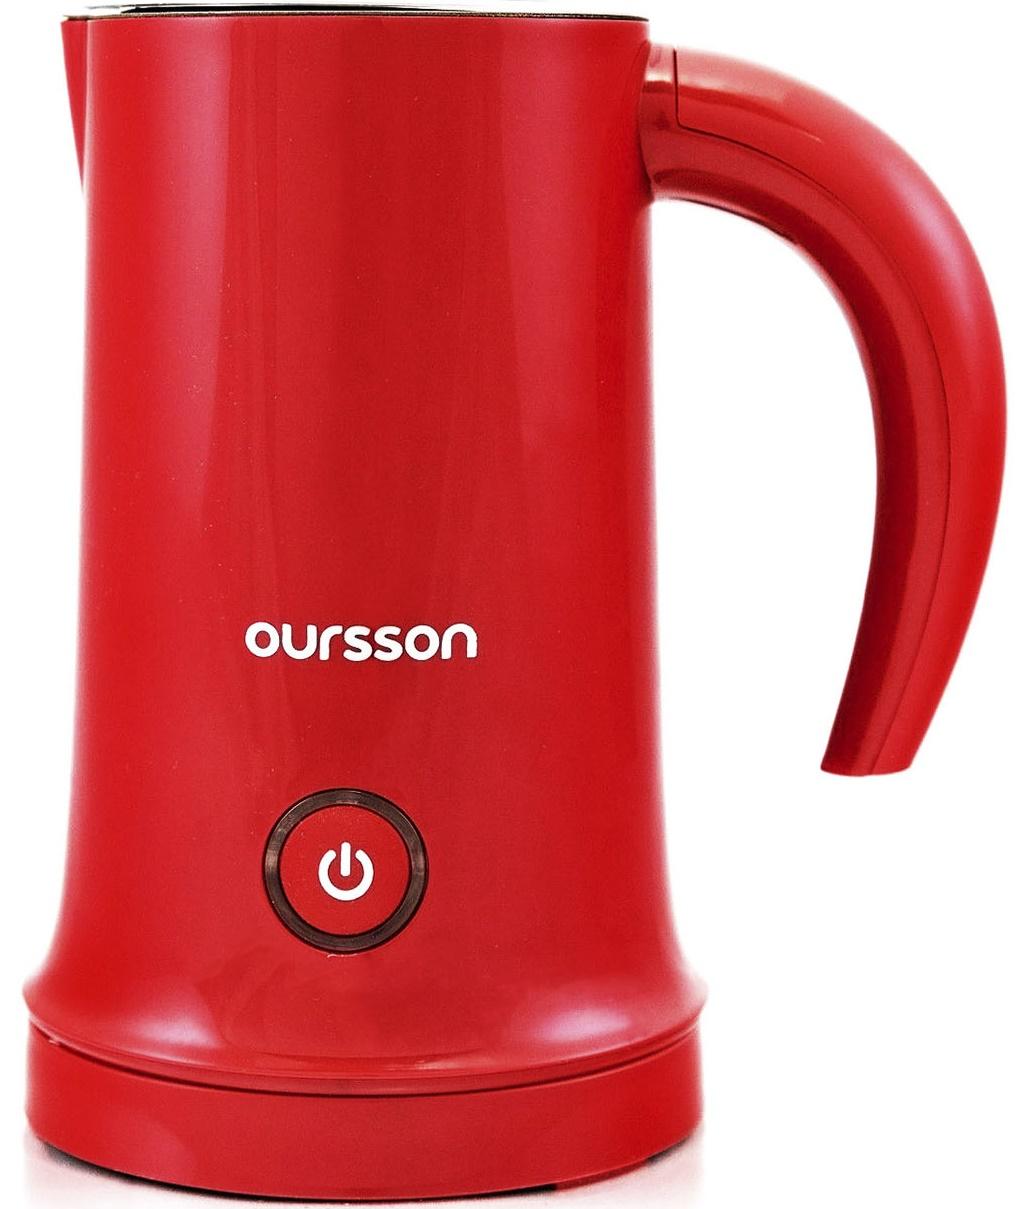 Aparat de spumare a laptelui Oursson MF2005/RD, 450W, rosu